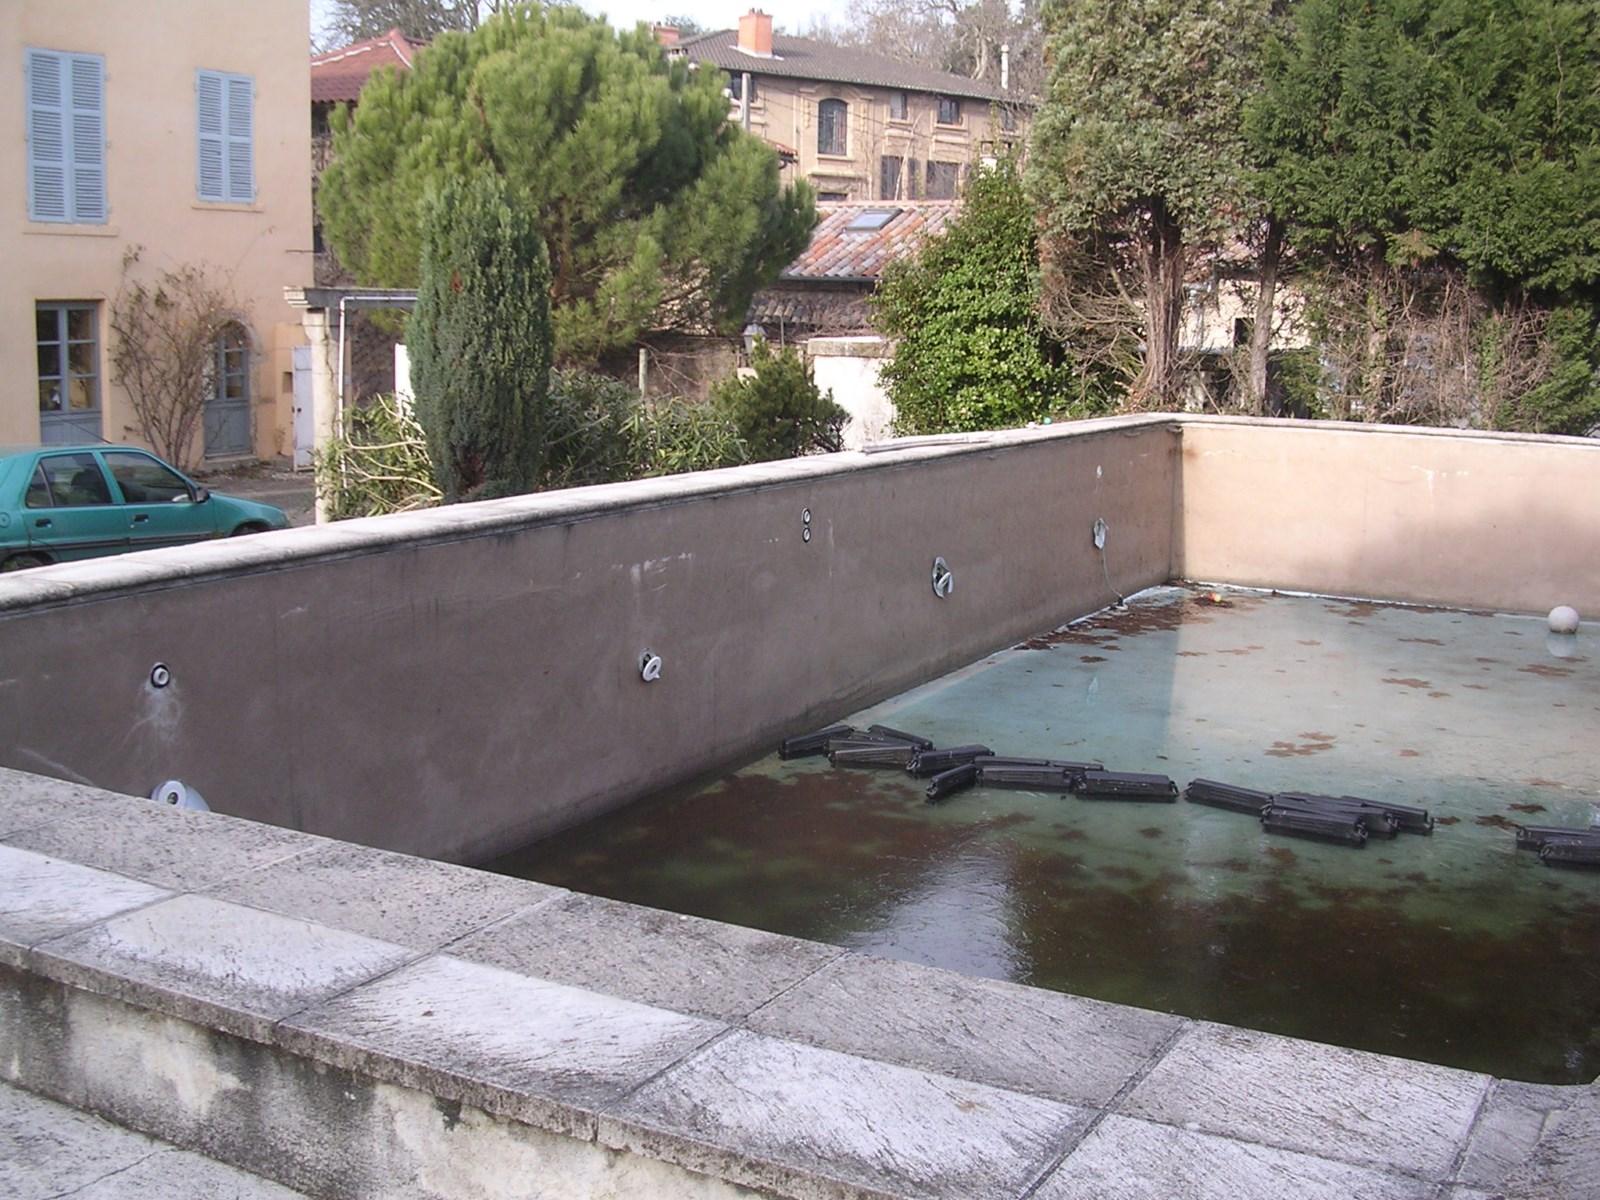 Ancienne piscine dans le rh ne 69 paysagiste dardilly for Constructeur piscine rhone